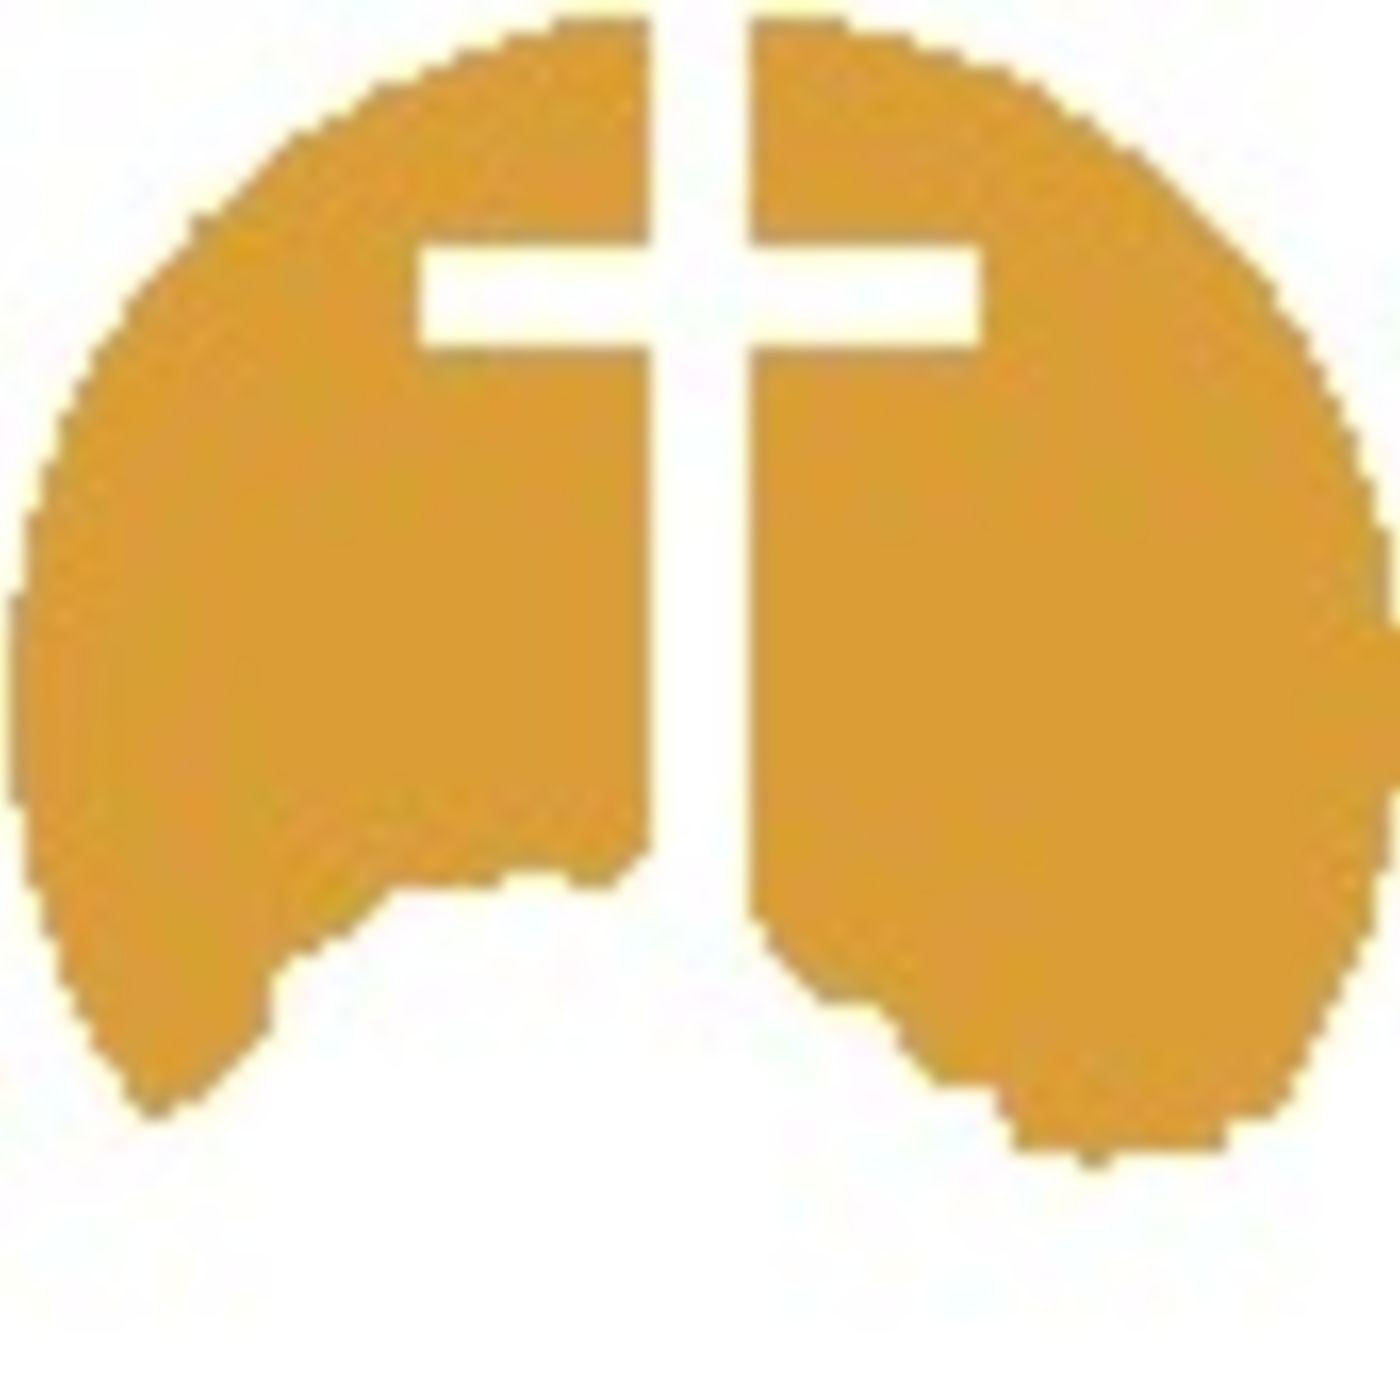 Purpose, Pillars, & Foundation, Part 1: The Foundation - Believing Prayer